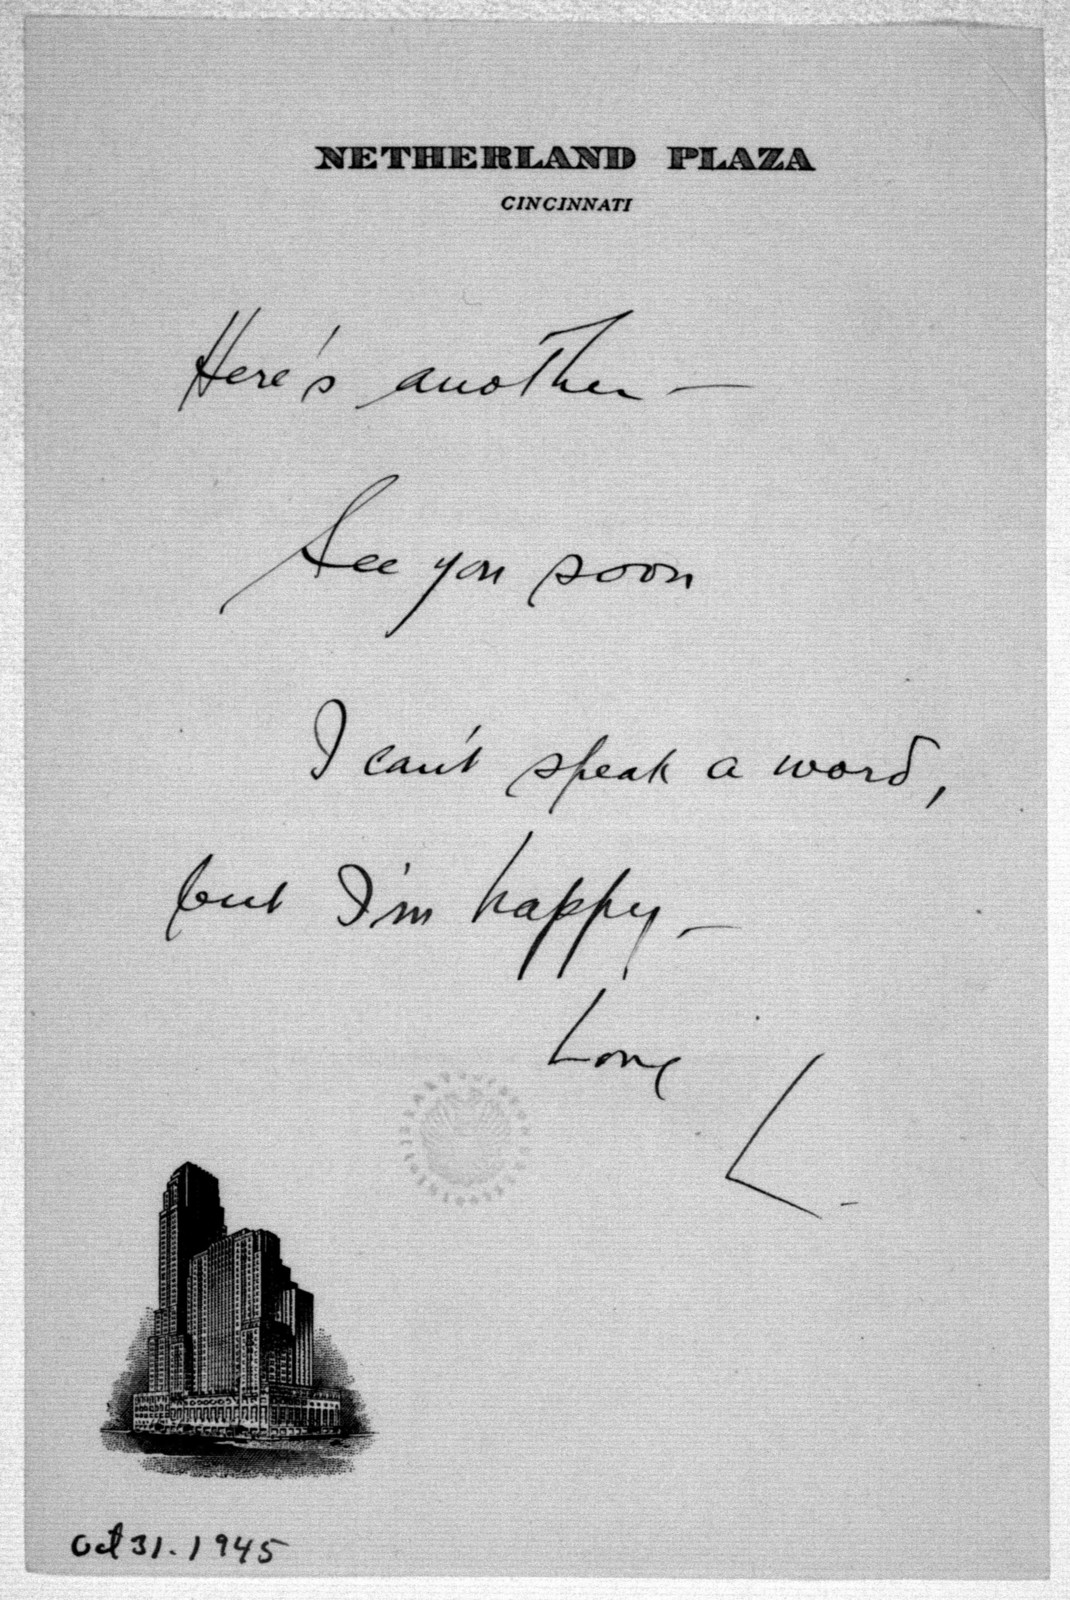 Letter from Leonard Bernstein to Helen Coates, October 31, 1945